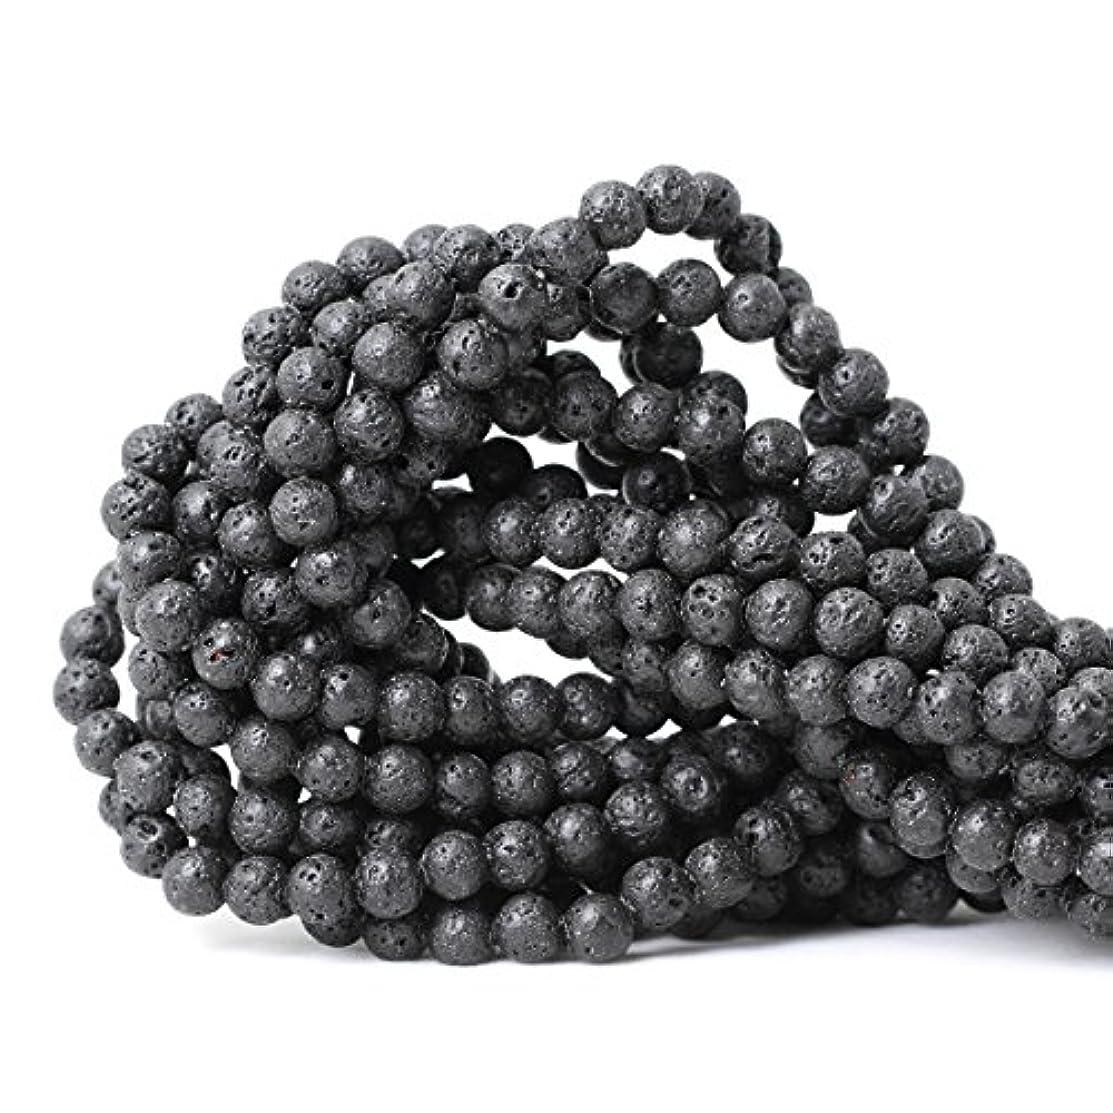 CHEAVIAN 6mm 60PCS Black Lava Volcanic Stone Gemstone Round Loose beads For Jewelry Making 1 Strand 15